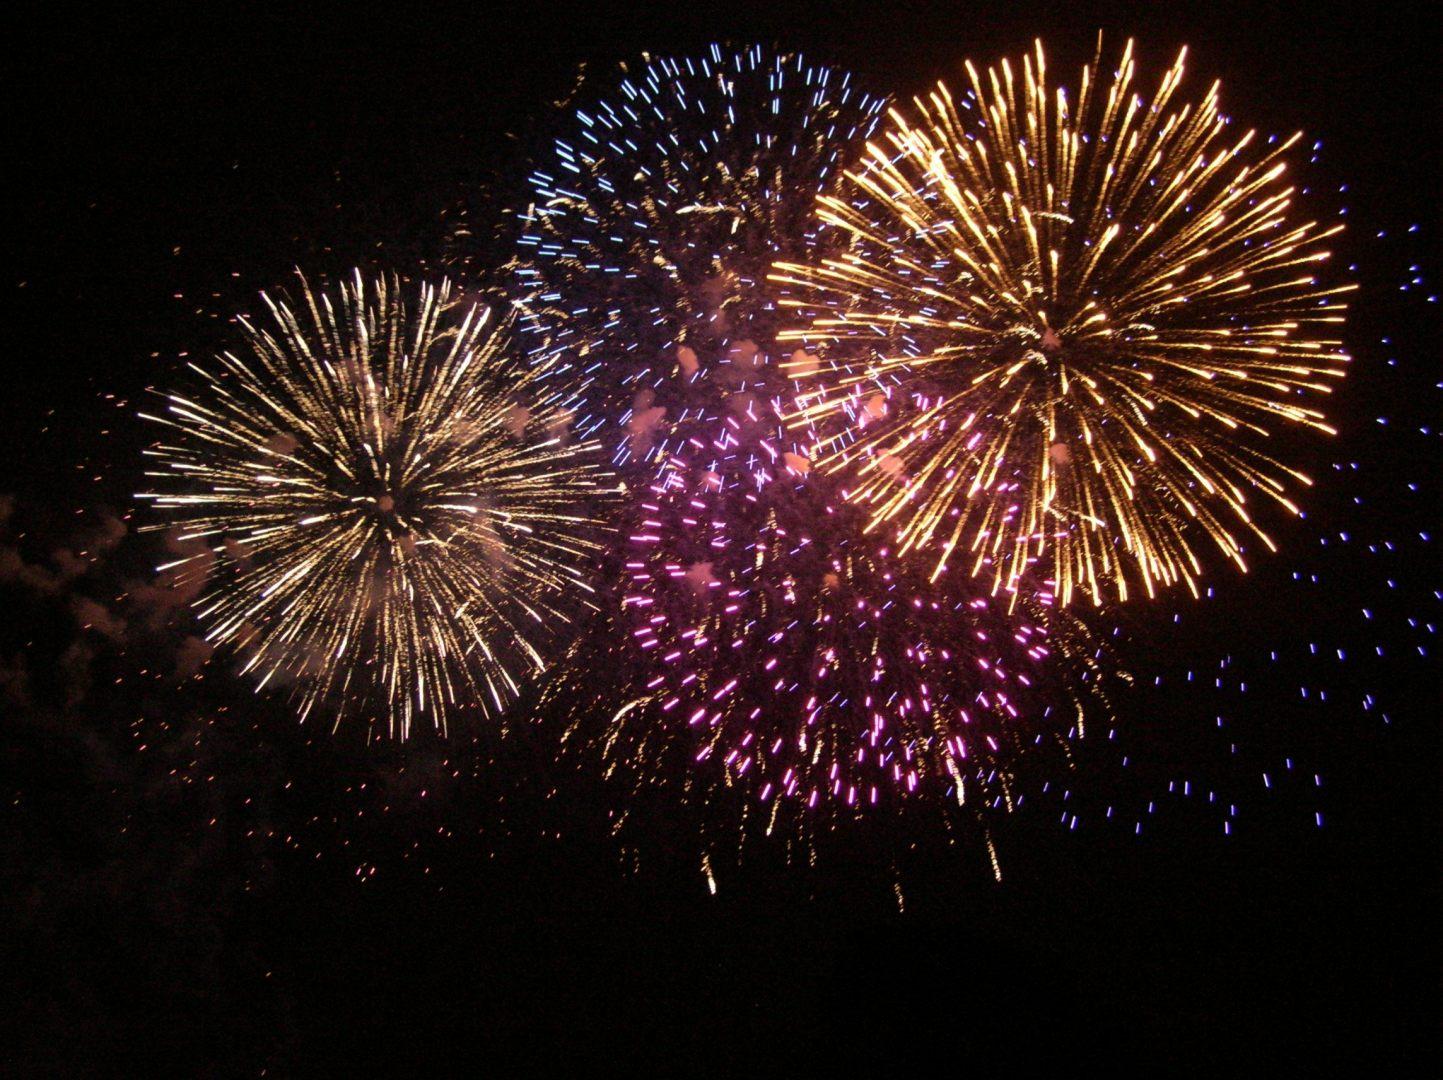 Fogos de artifício de todas as cores PlusPng.com  - PNG Fogos De Artificio